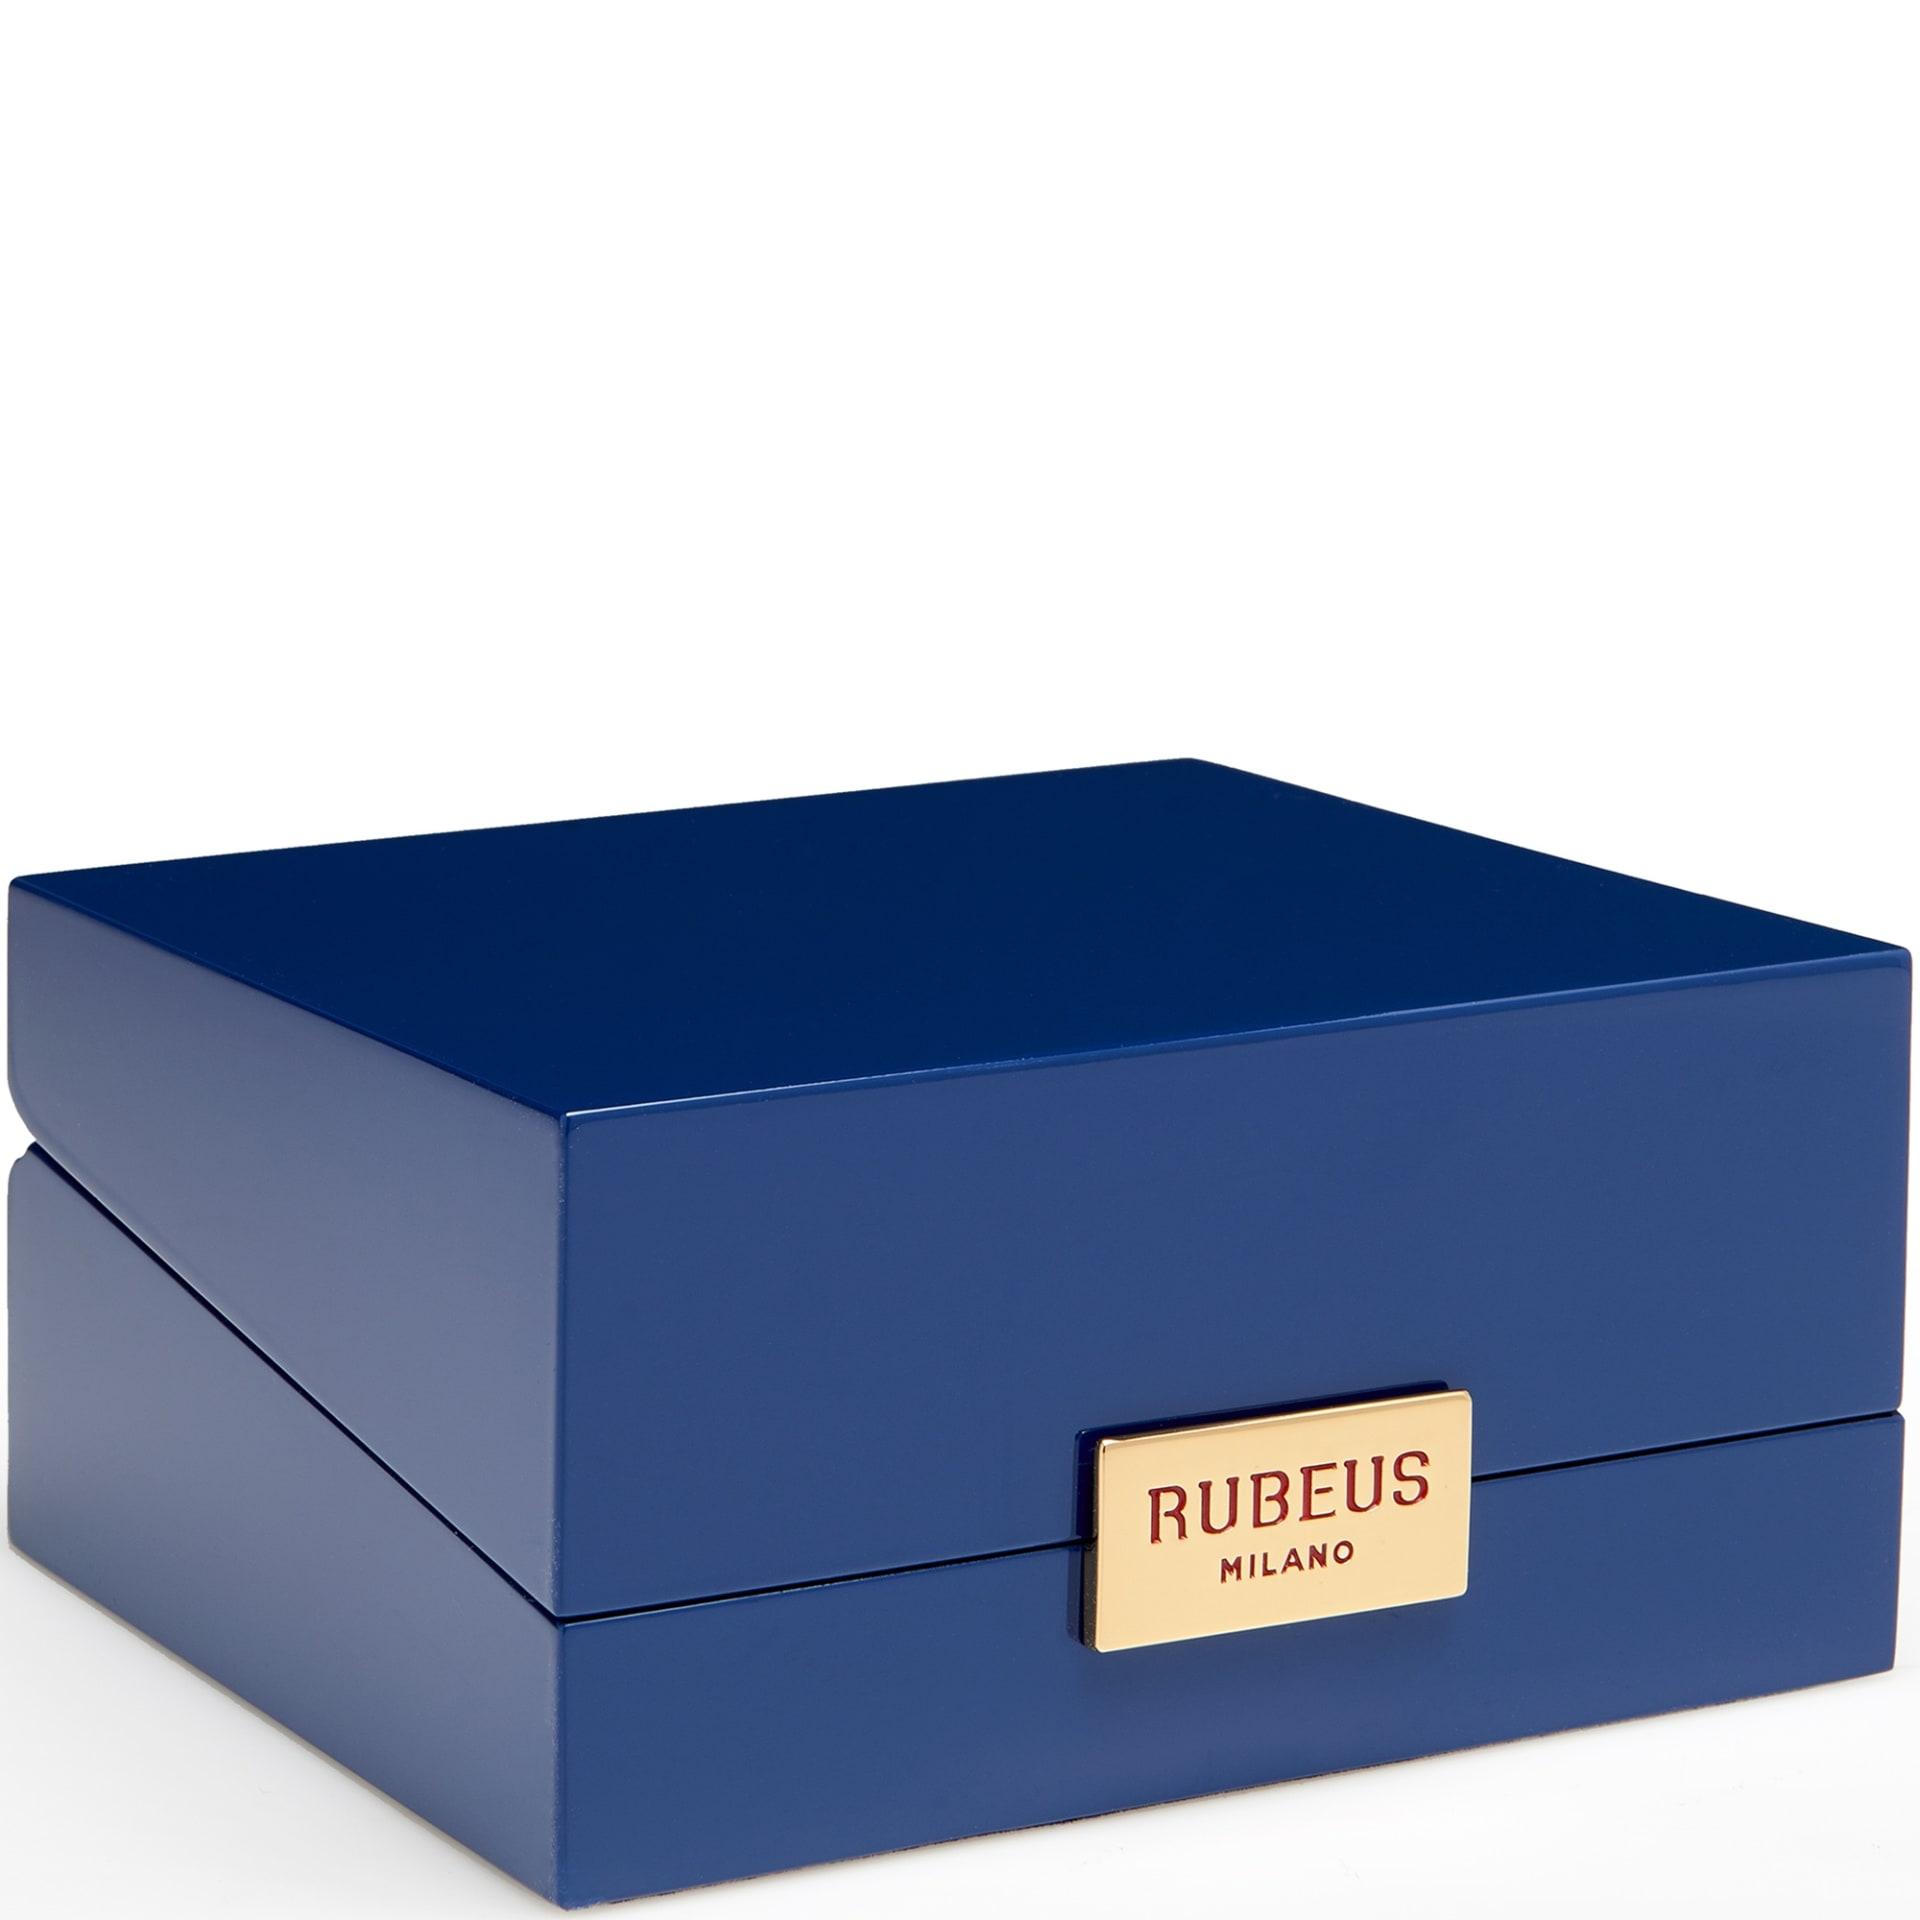 rubeus-milano-bleu-4